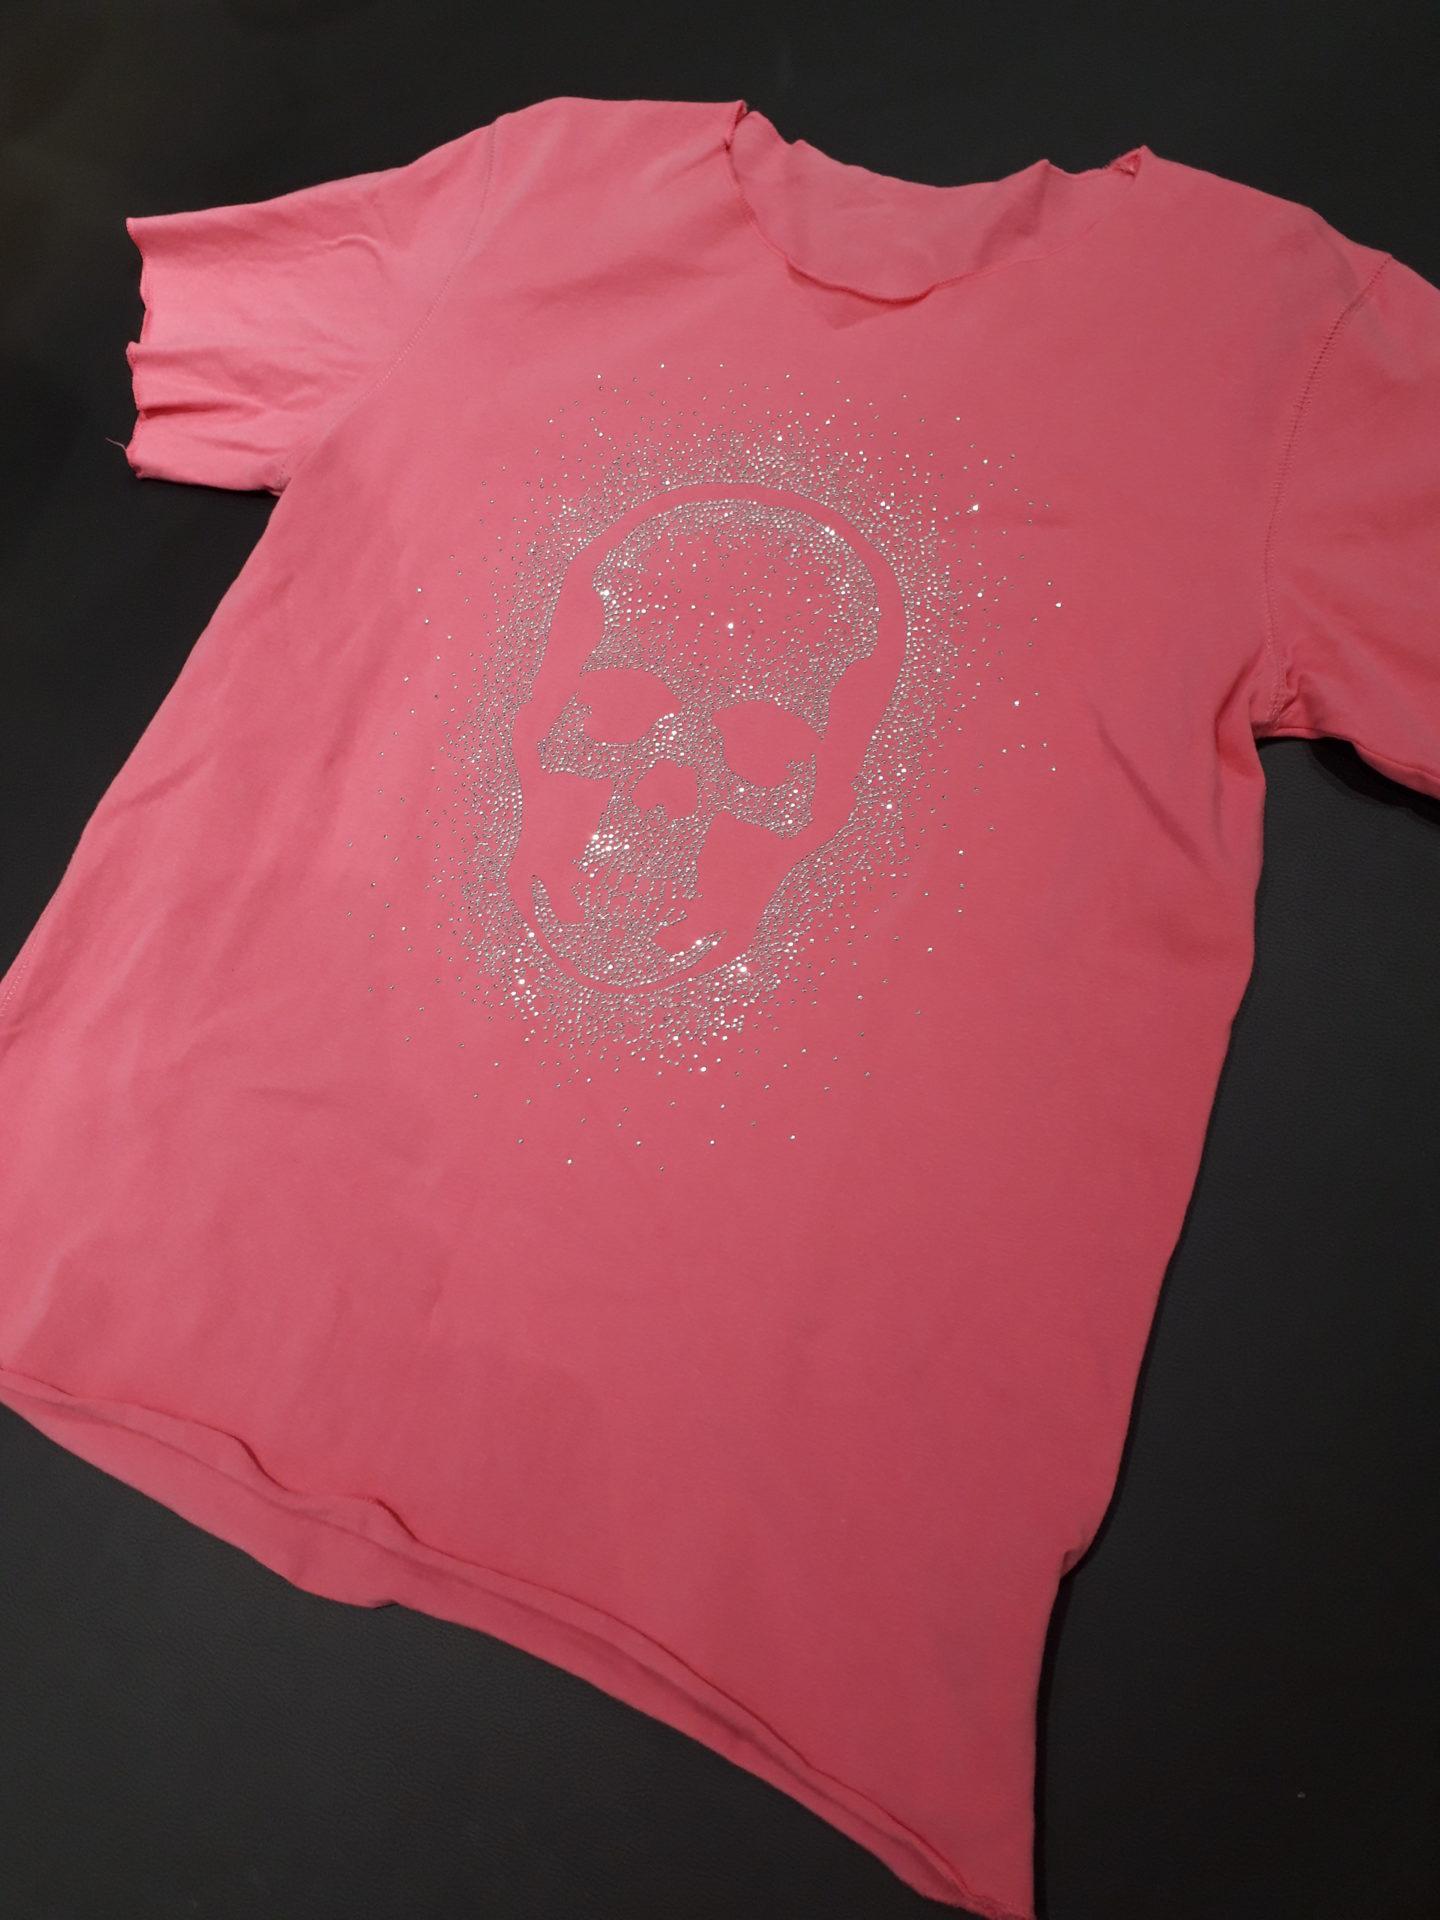 【lucien pellat-finet 買取 盛岡】Tシャツを盛岡市のお客様よりお買取させていただきました!